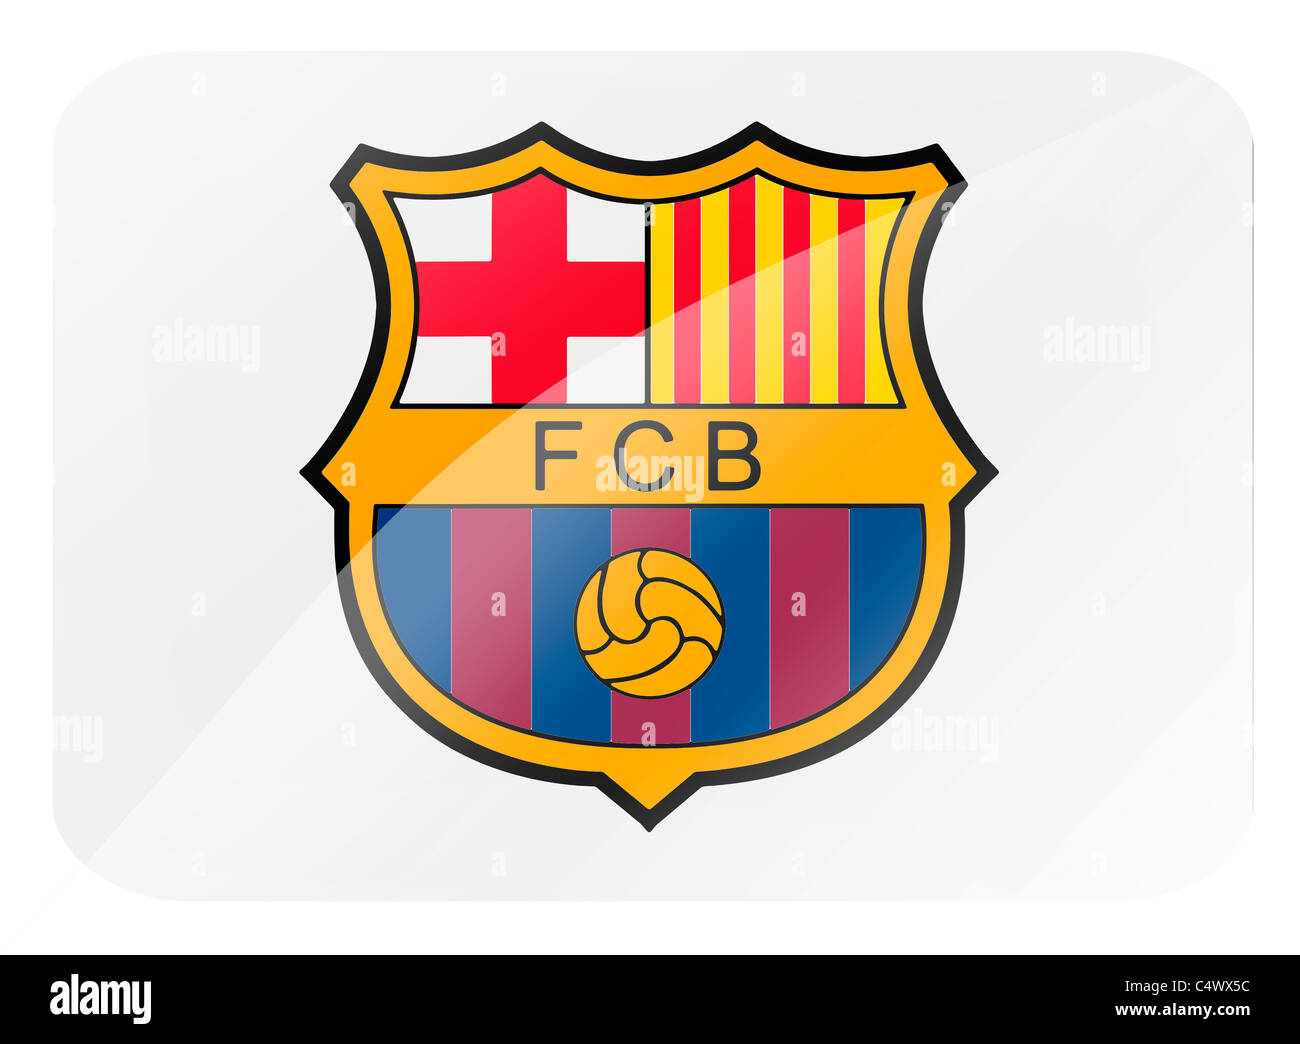 F C Barcelona Logo Flag Symbol Stock Photo Alamy